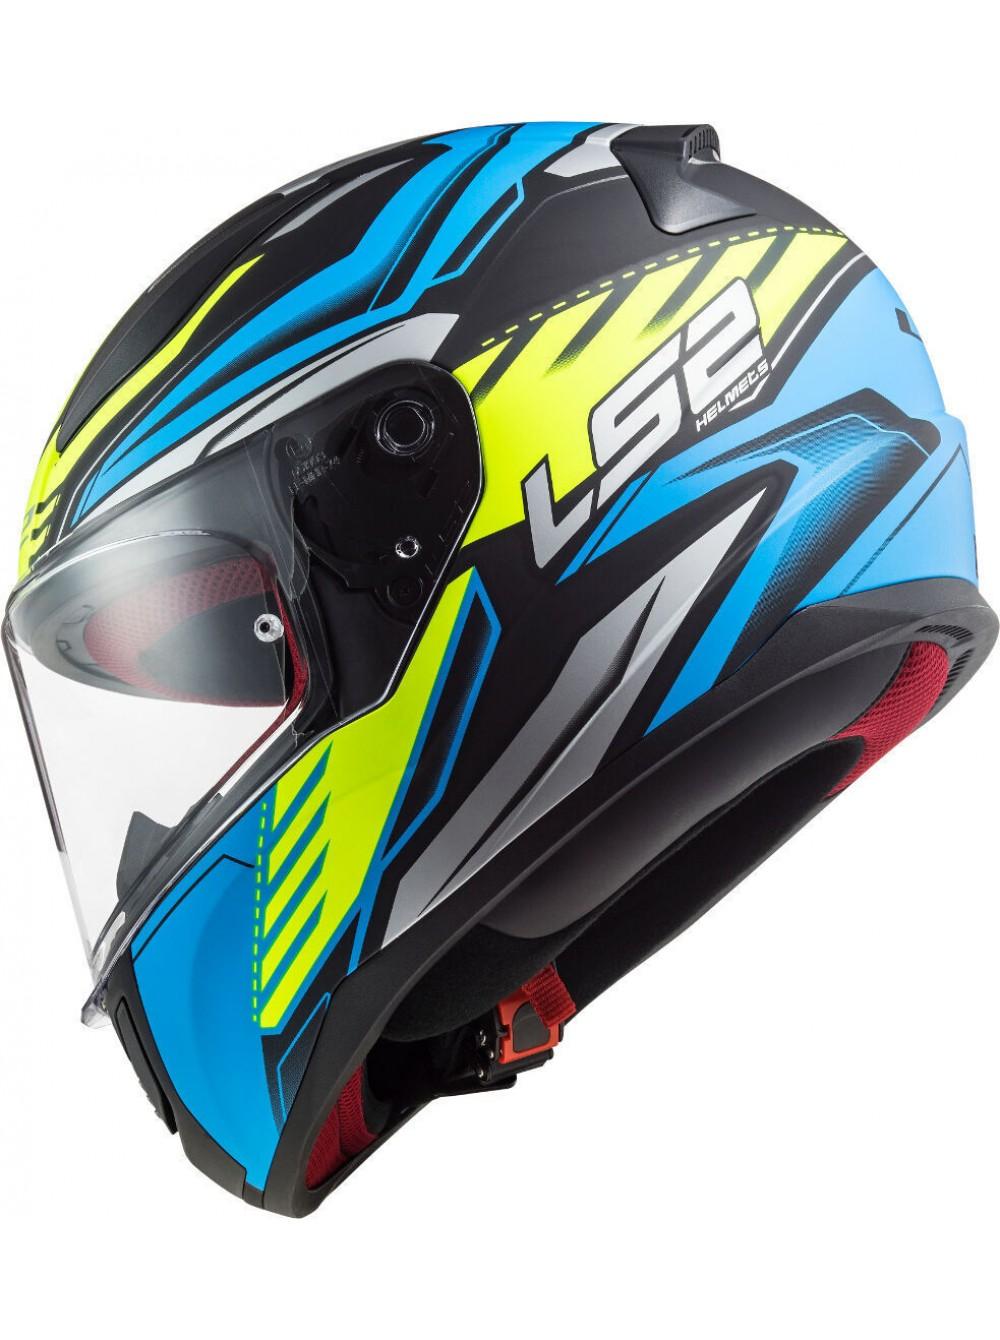 МОТОШЛЕМ LS2 FF353 RAPID GALE MATT BLACK BLUE YELLOW  Артмото - купить квадроцикл в украине и харькове, мотоцикл, снегоход, скутер, мопед, электромобиль